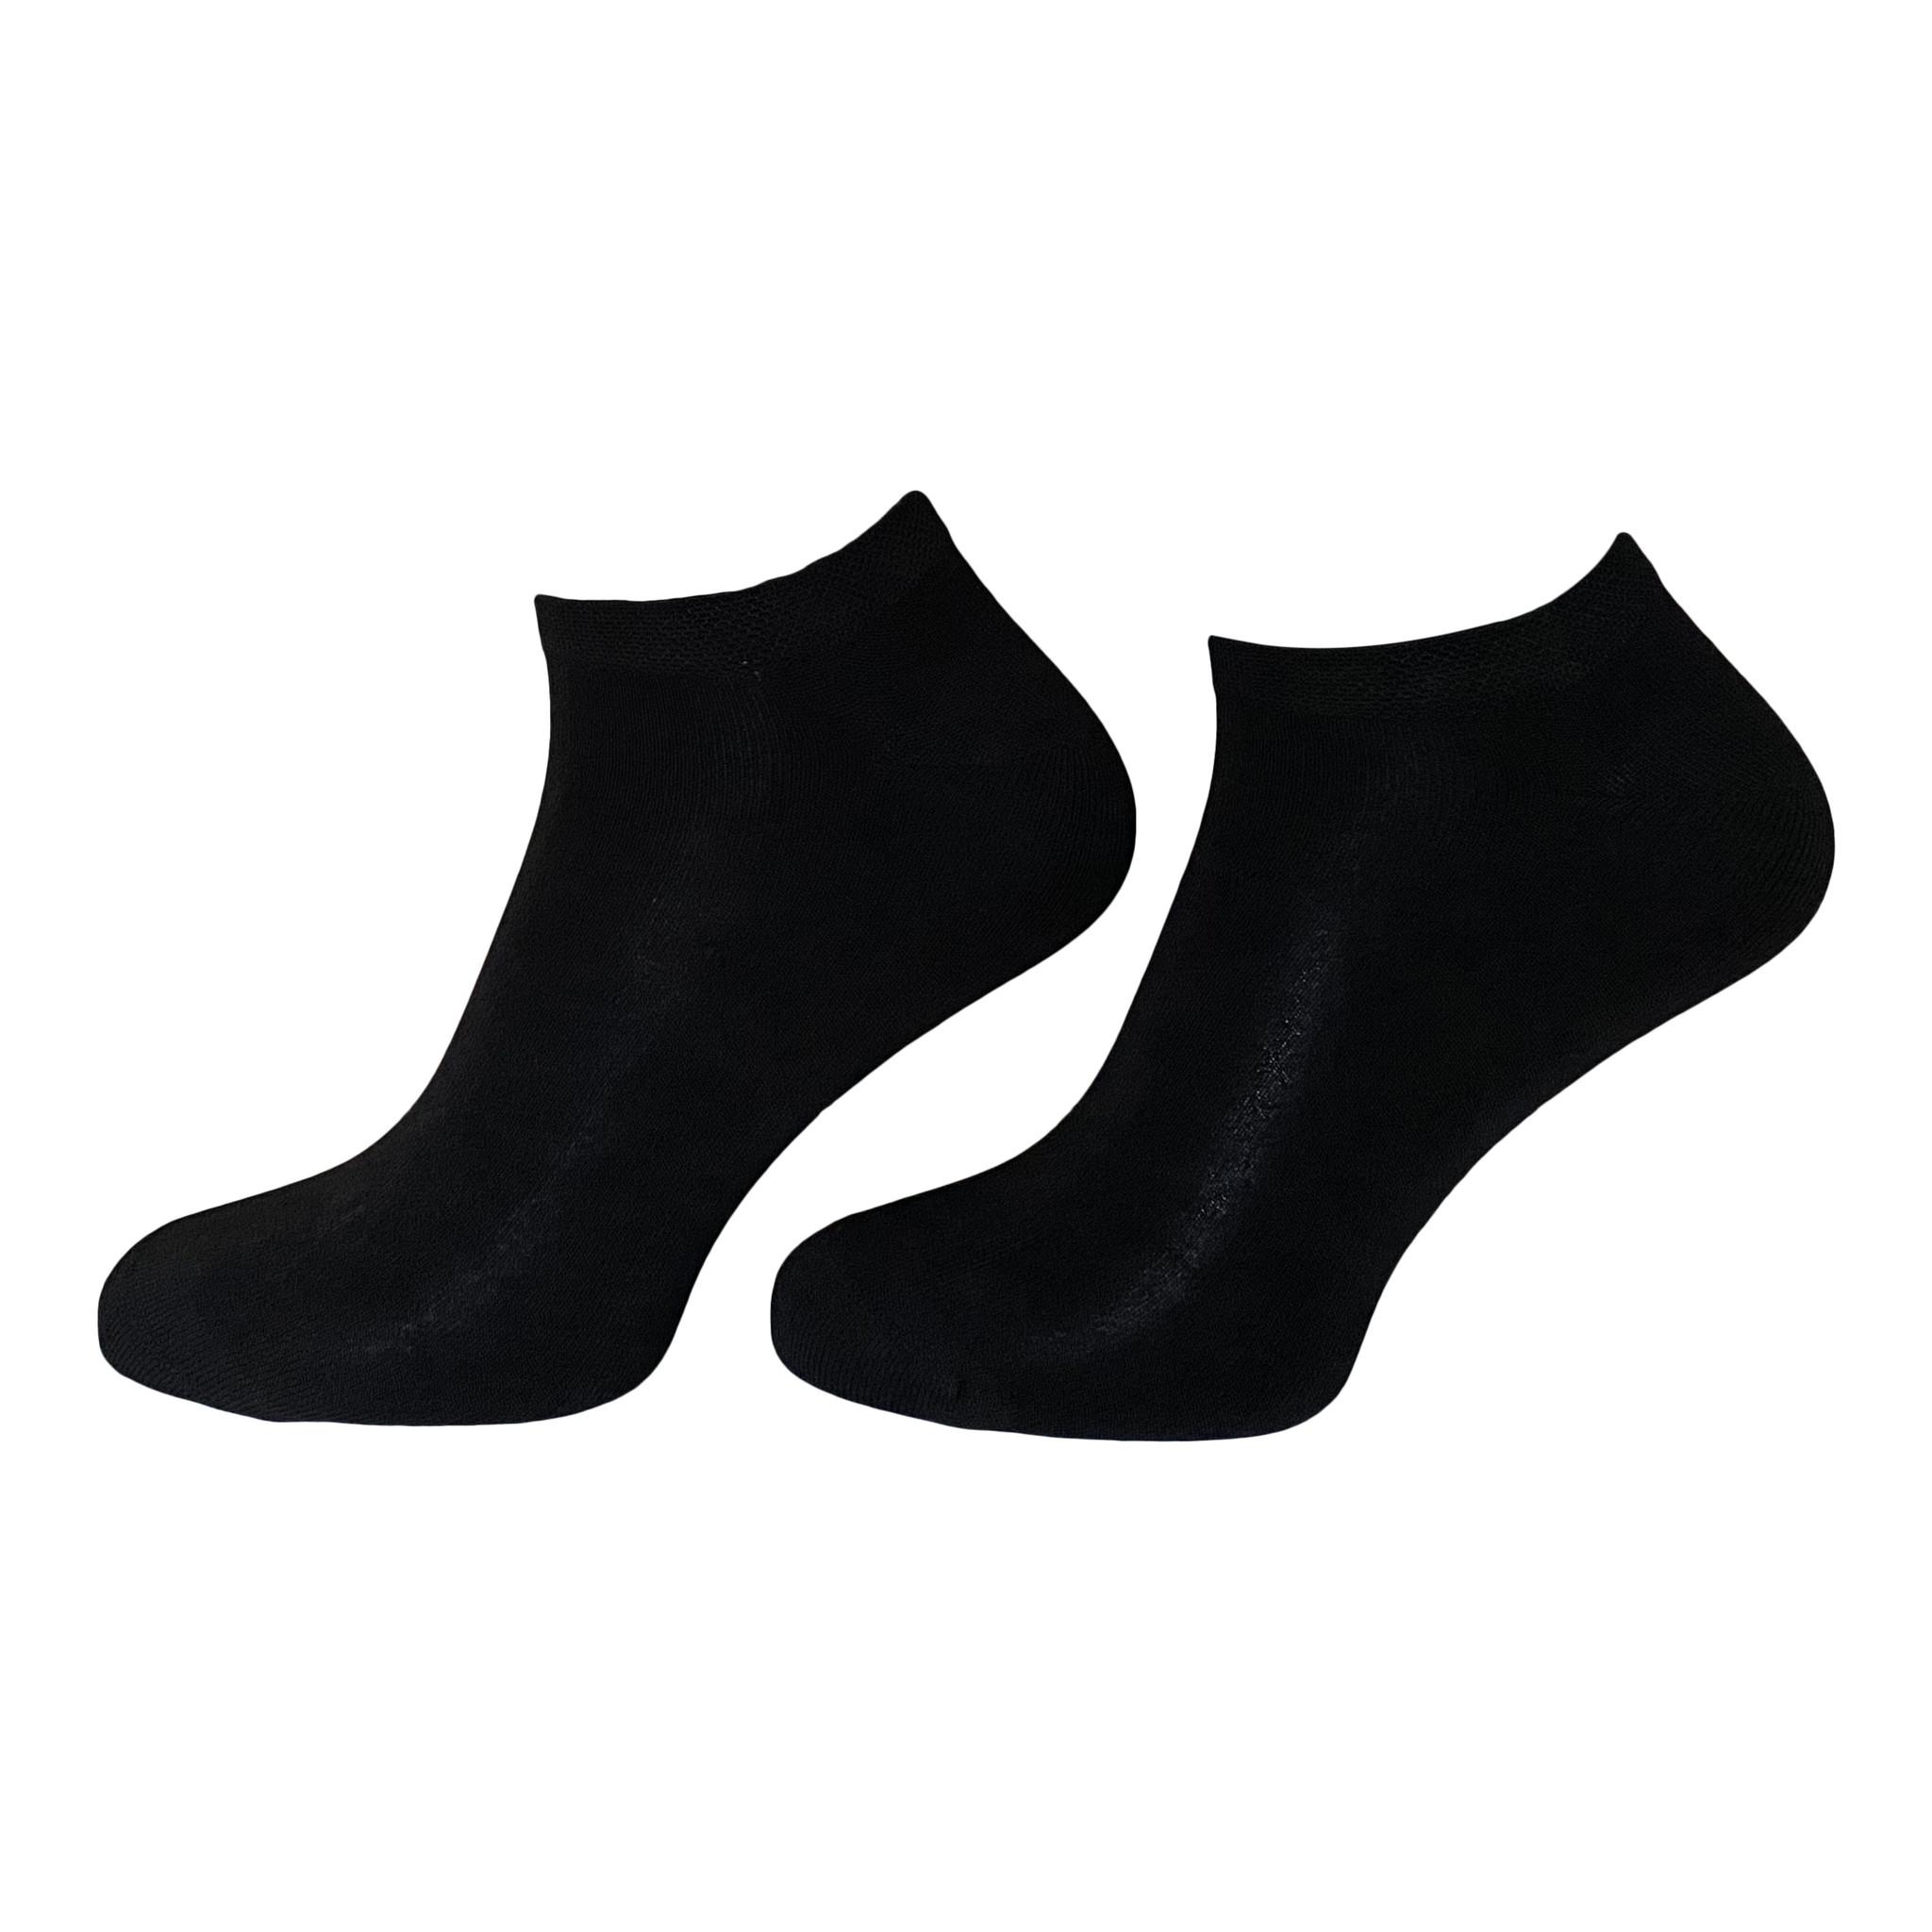 BORU Boru Bamboe Terry sneakersokken - zwart